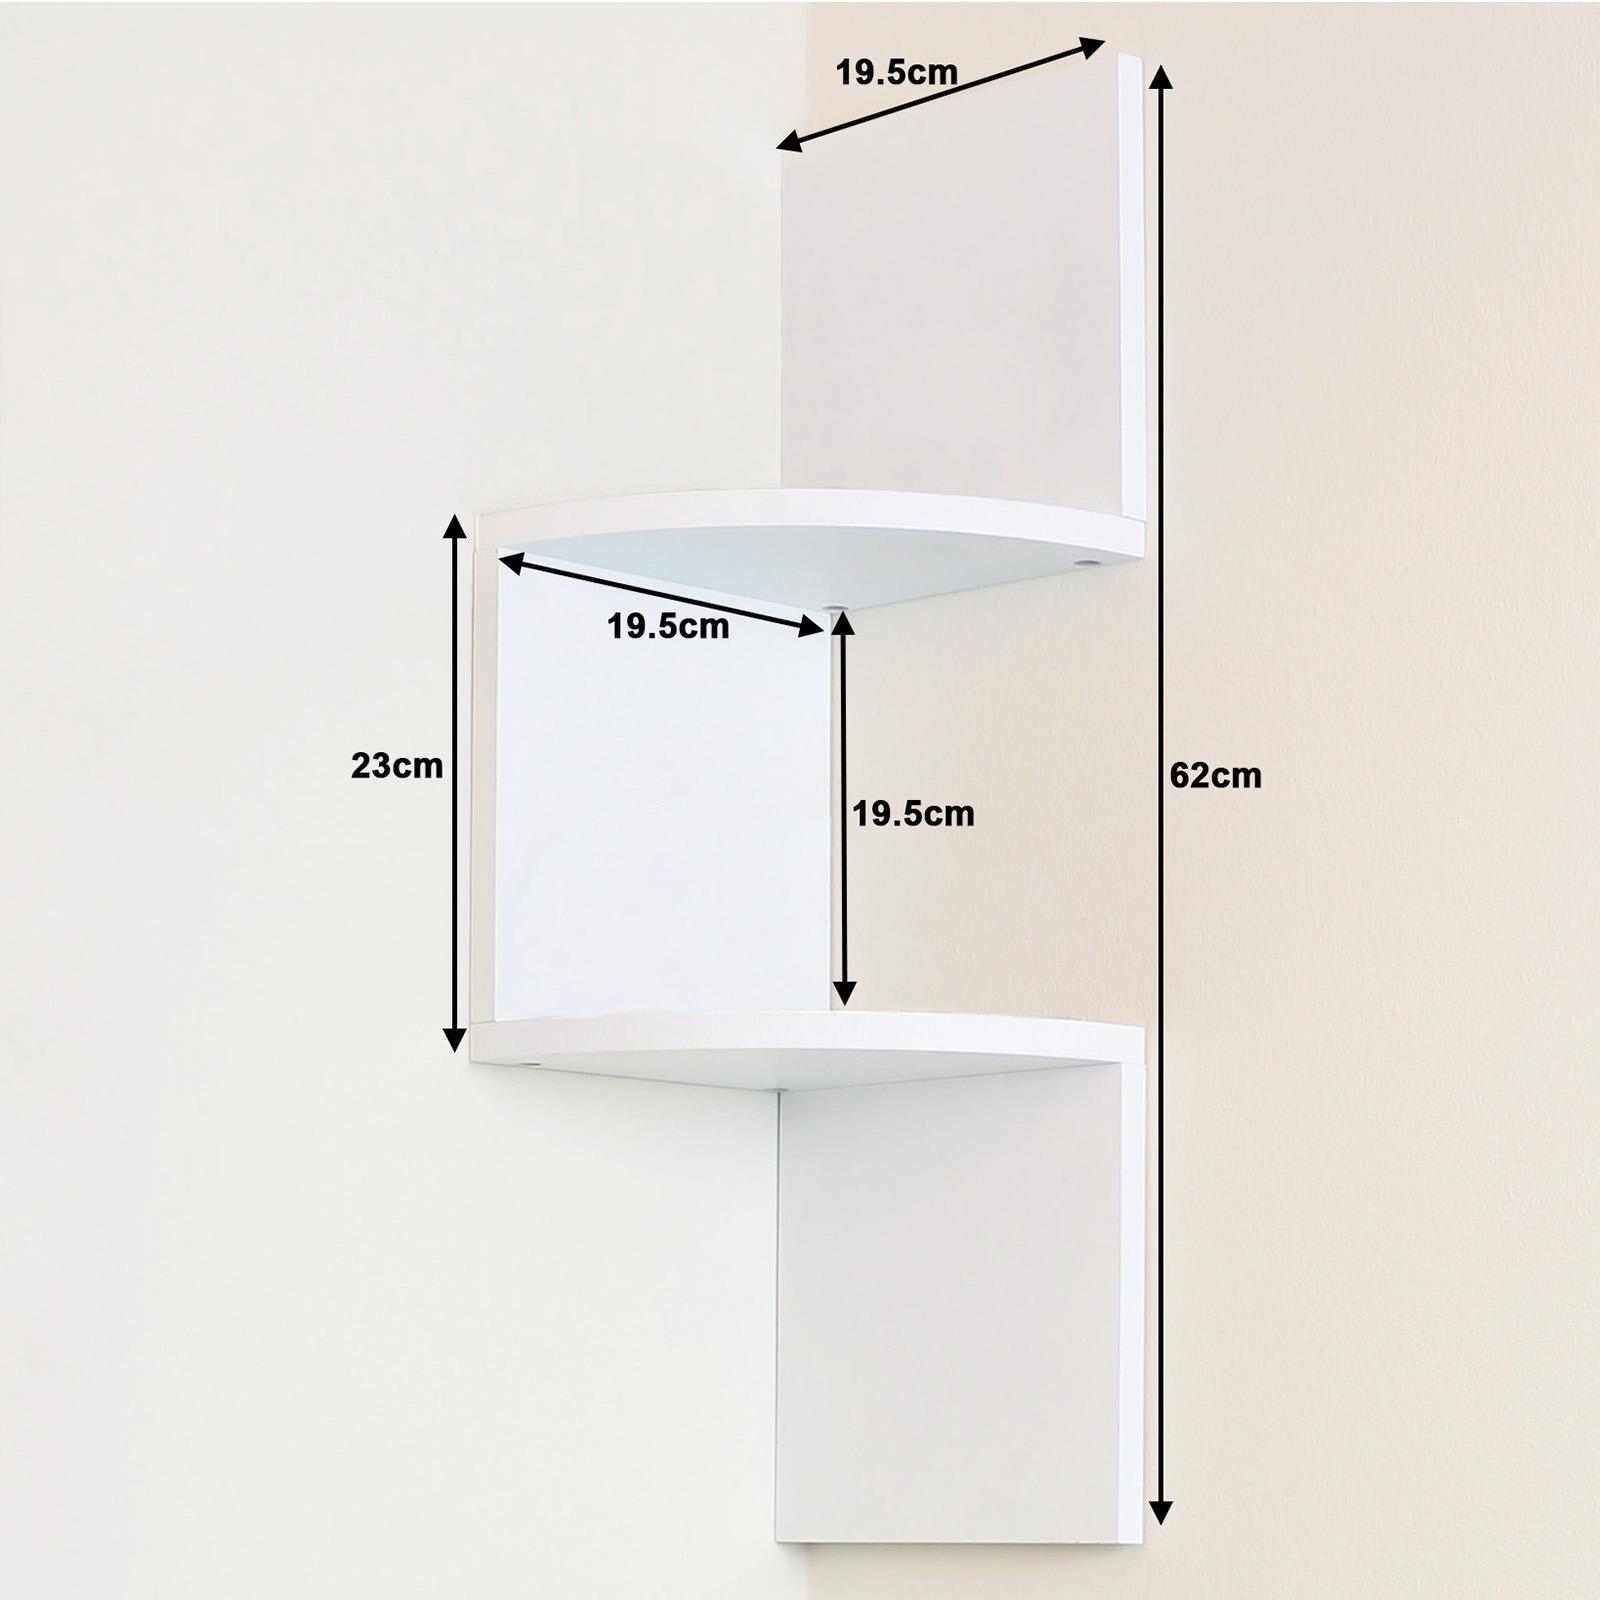 2 Tier White Wall Mounted Zigzag Corner Floating Shelf